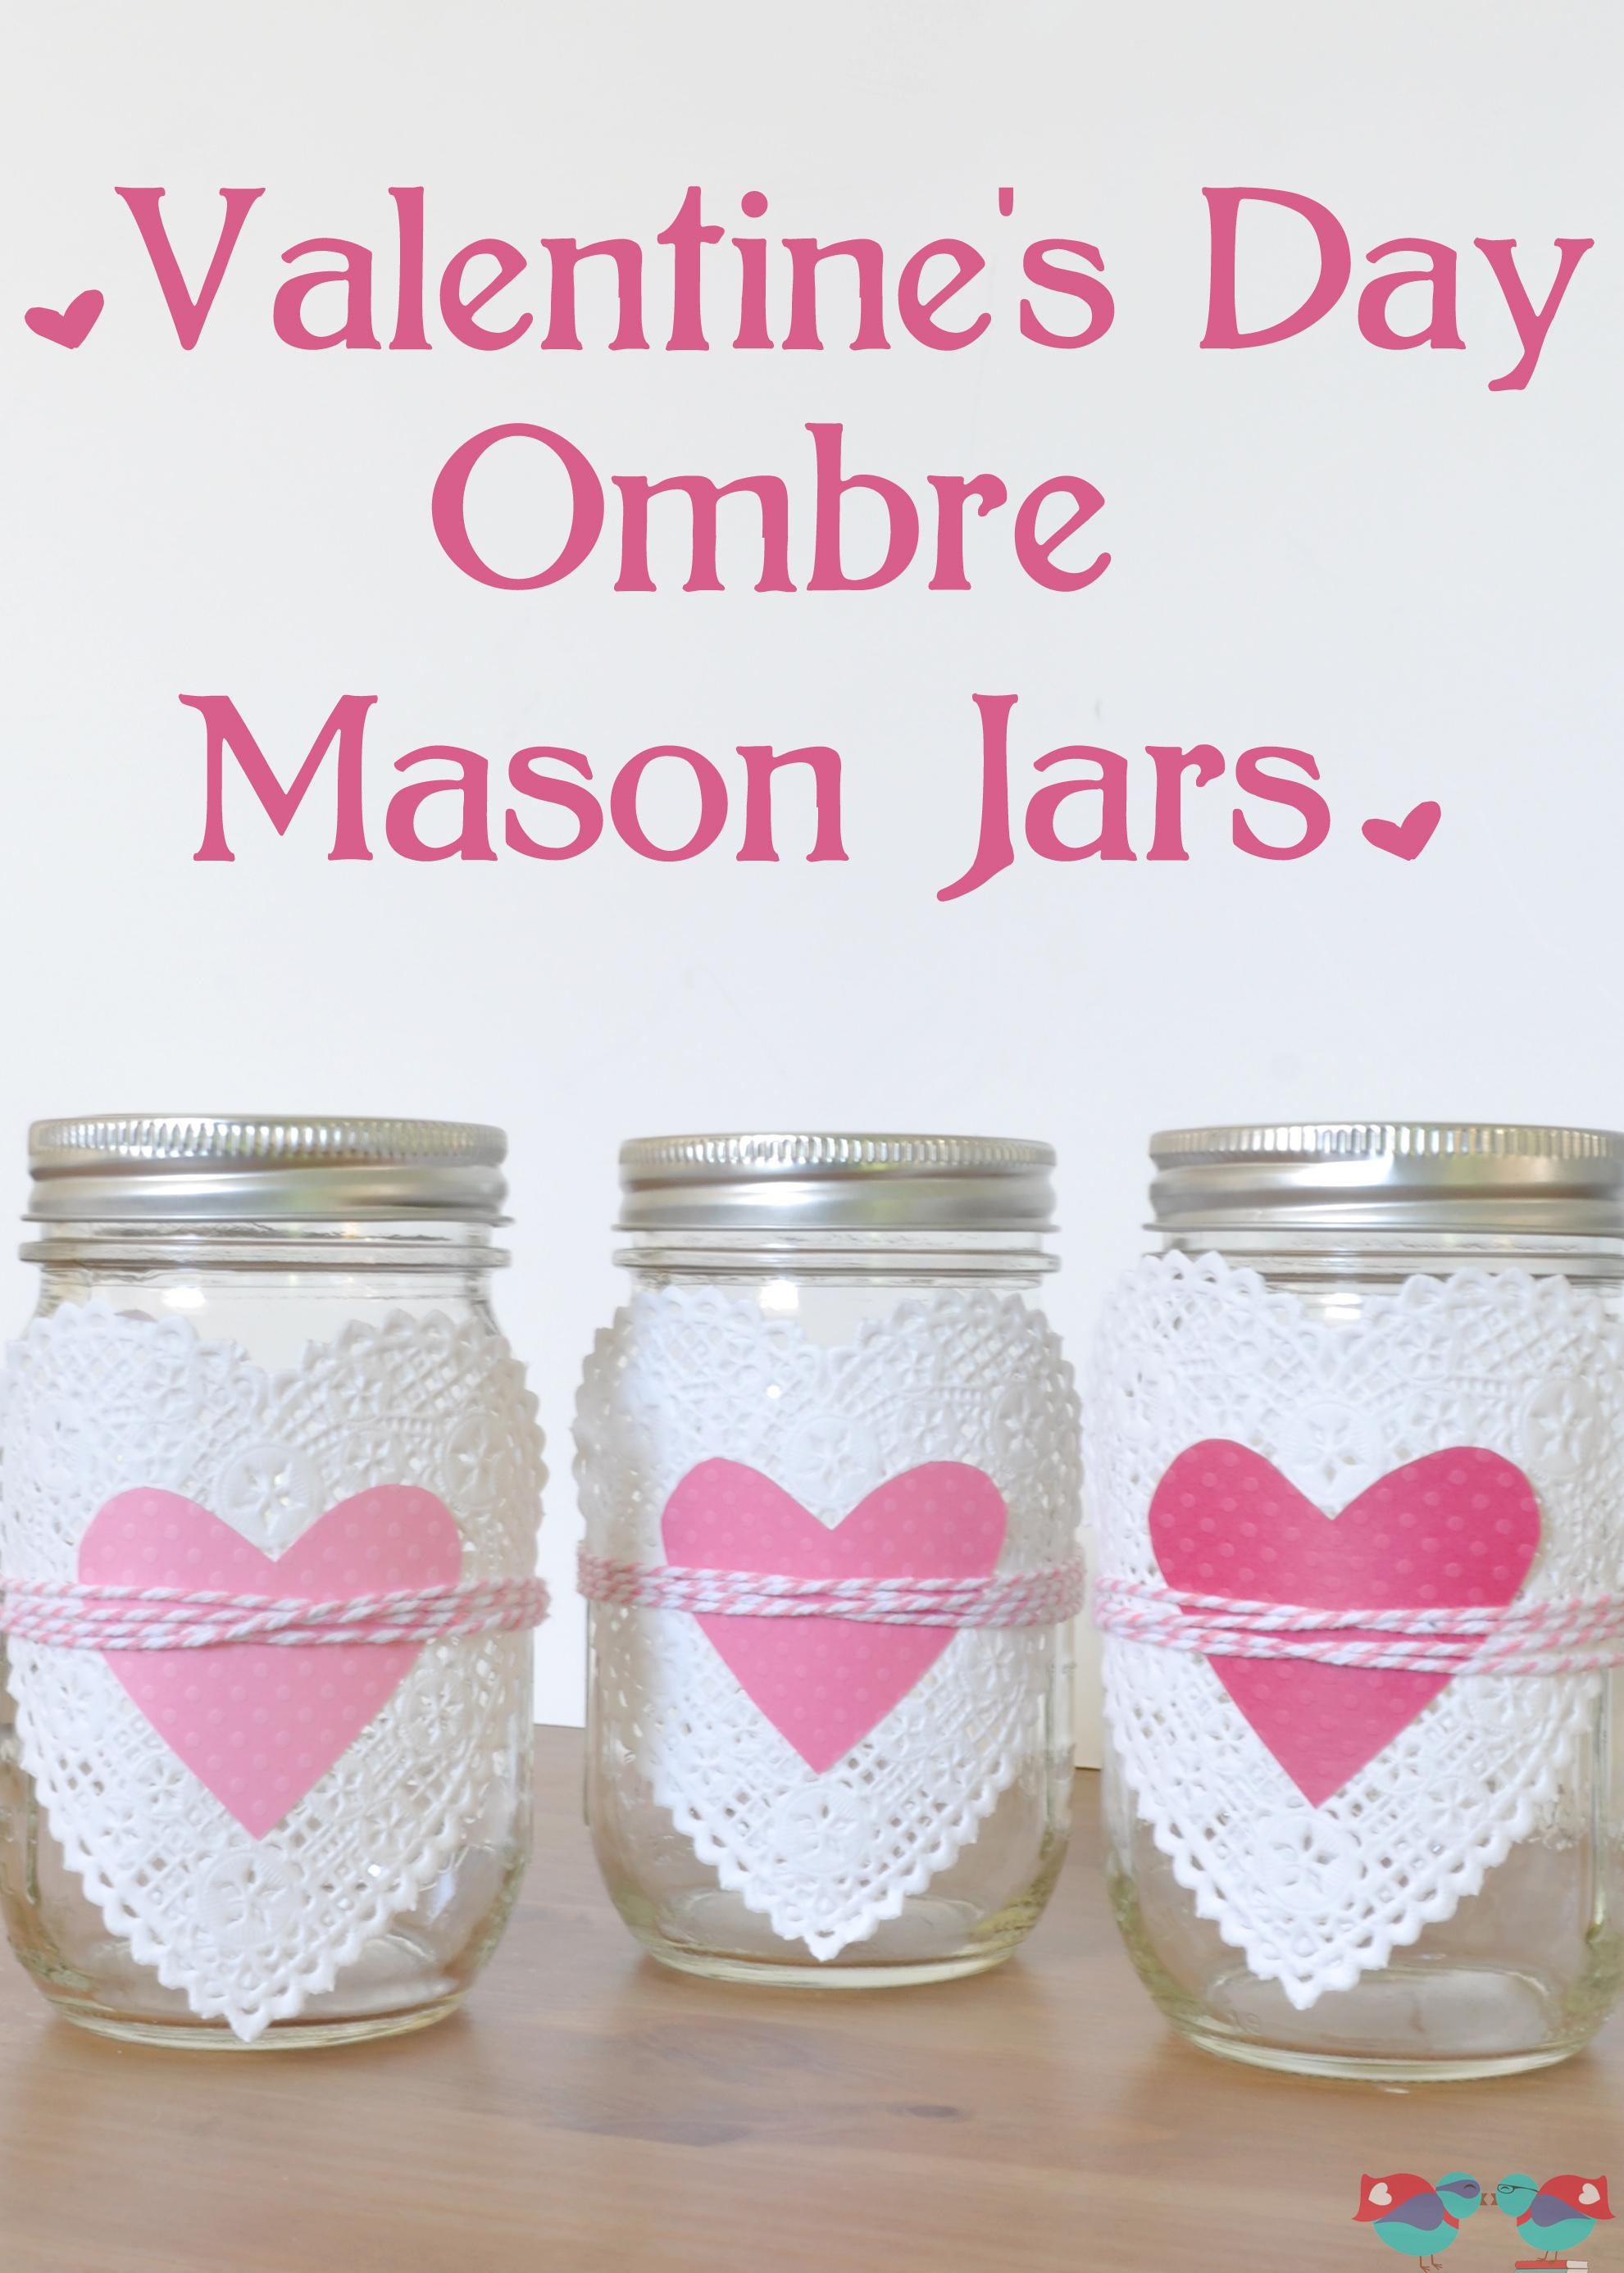 Lovely Ombre Heart Mason Jars - The Love Nerds